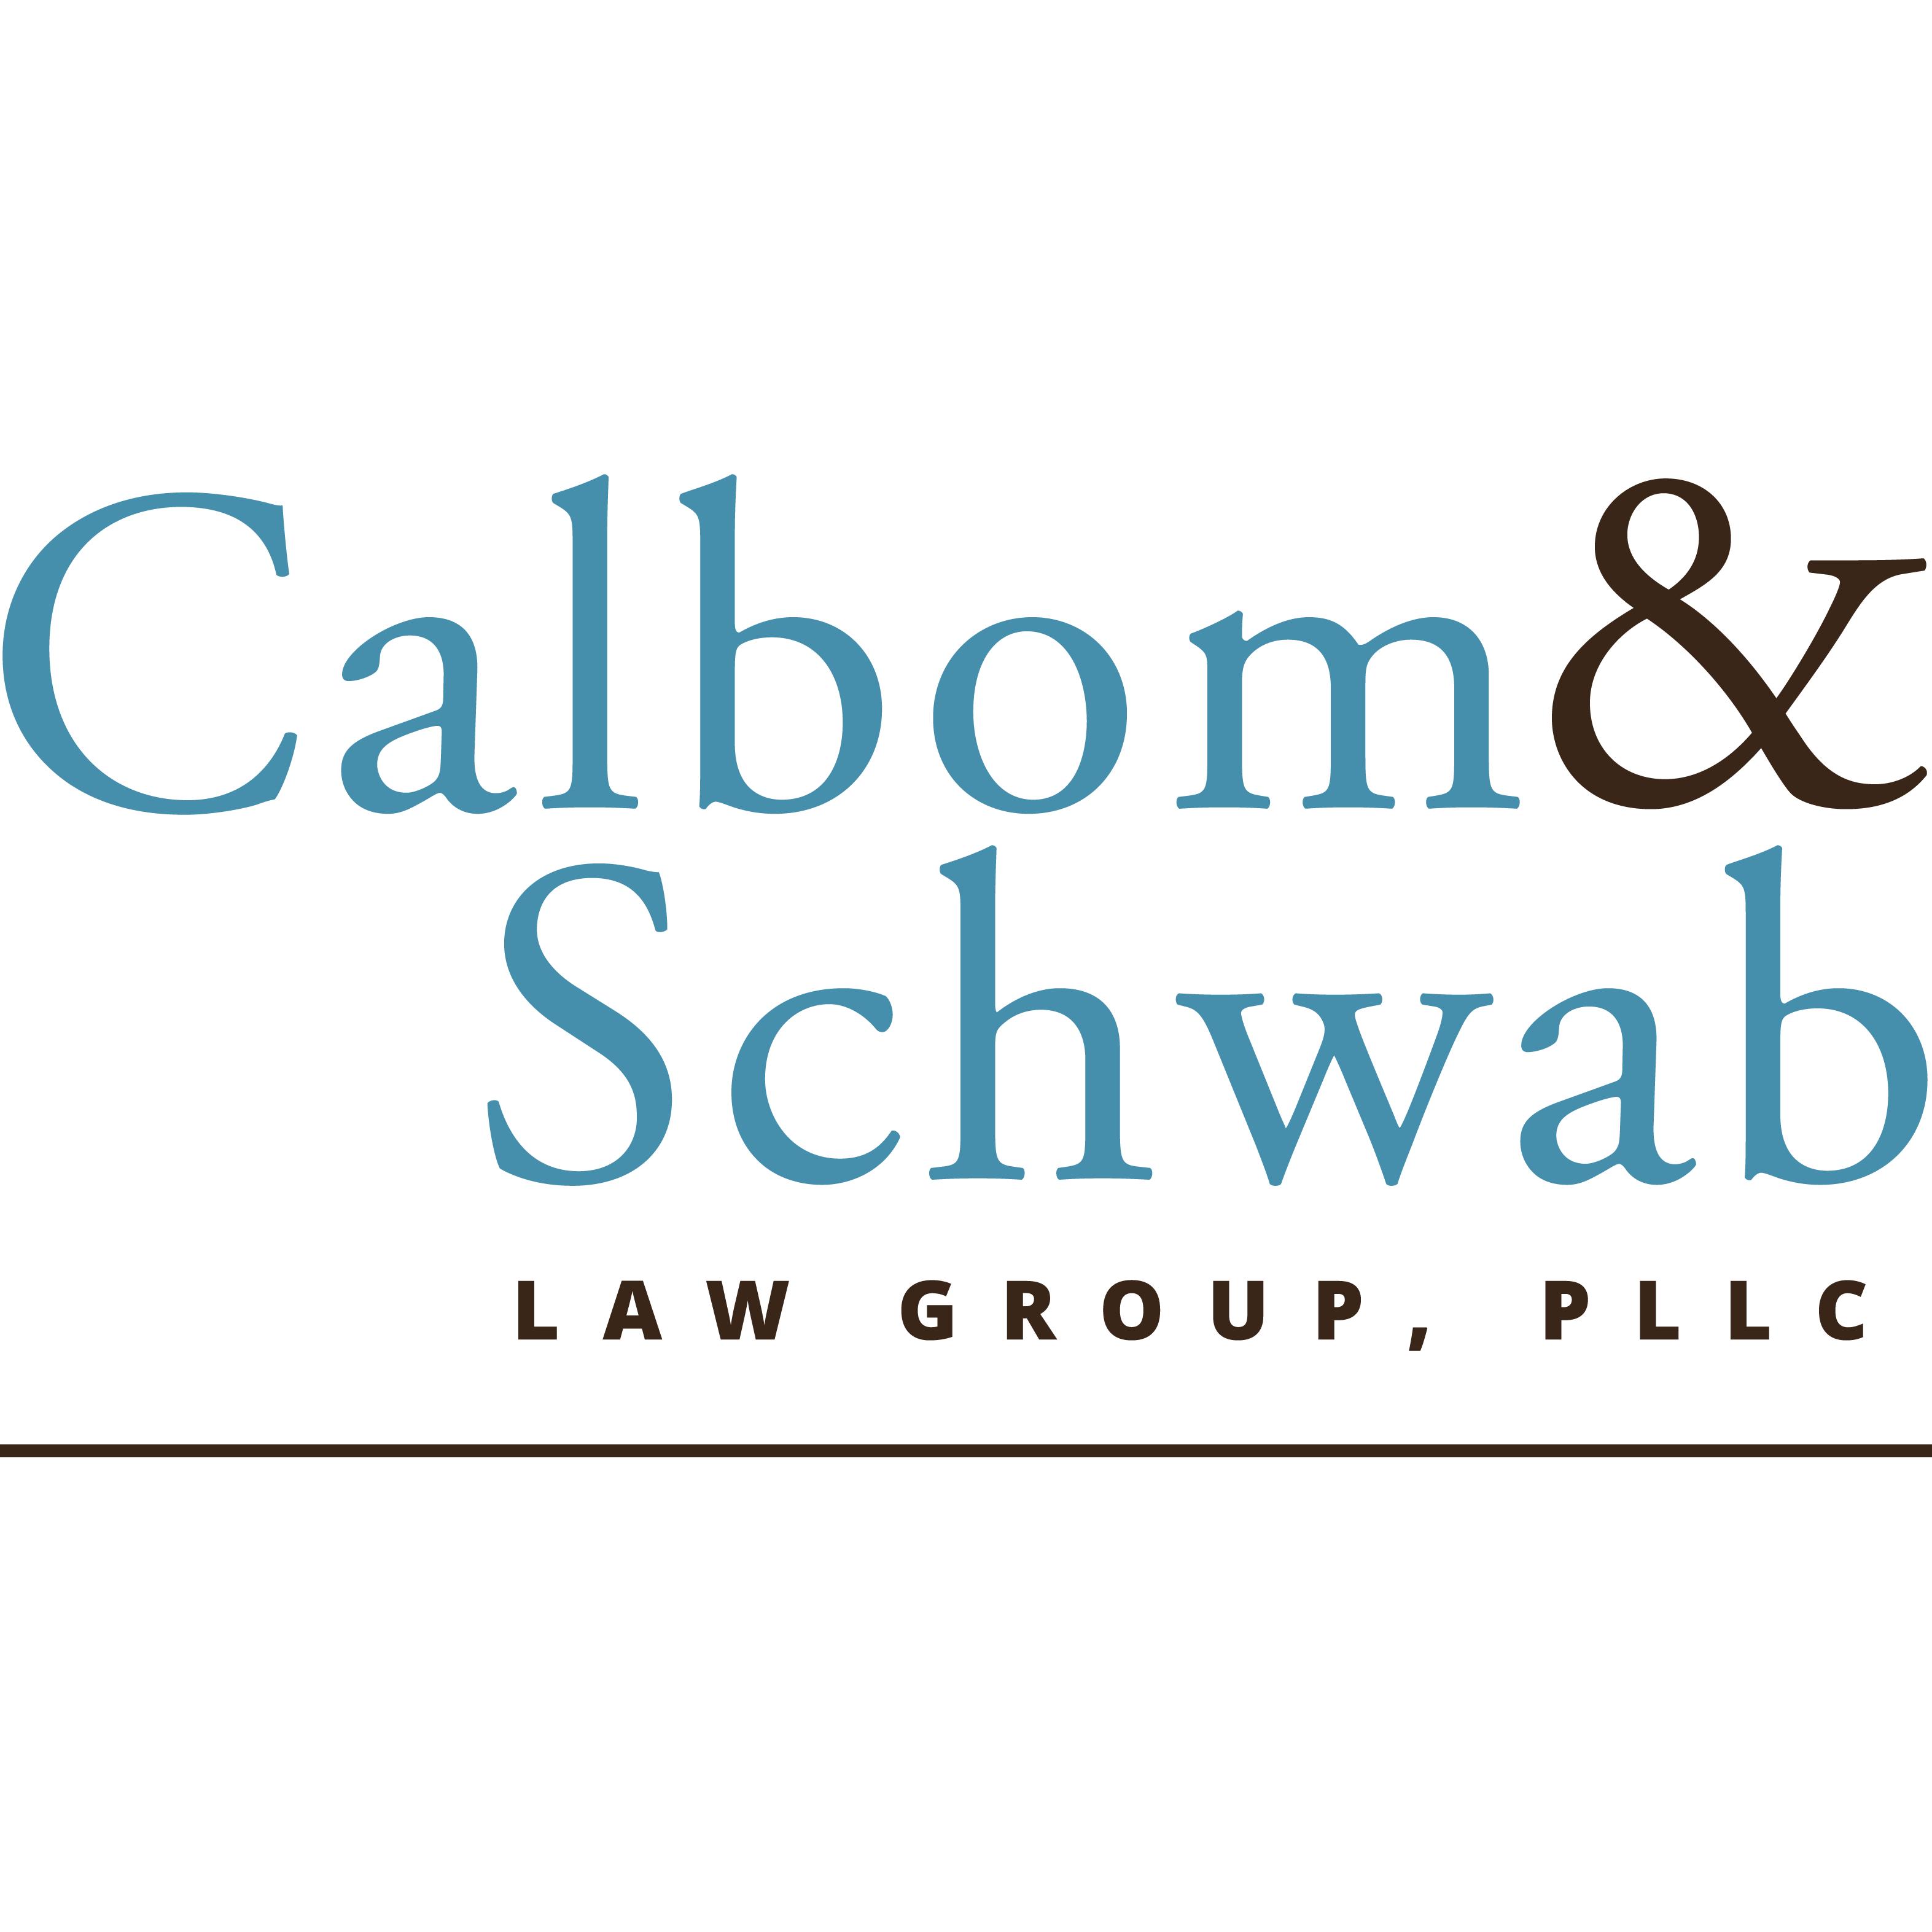 Calbom & Schwab Law Group, PLLC - Ellensburg, WA - Attorneys